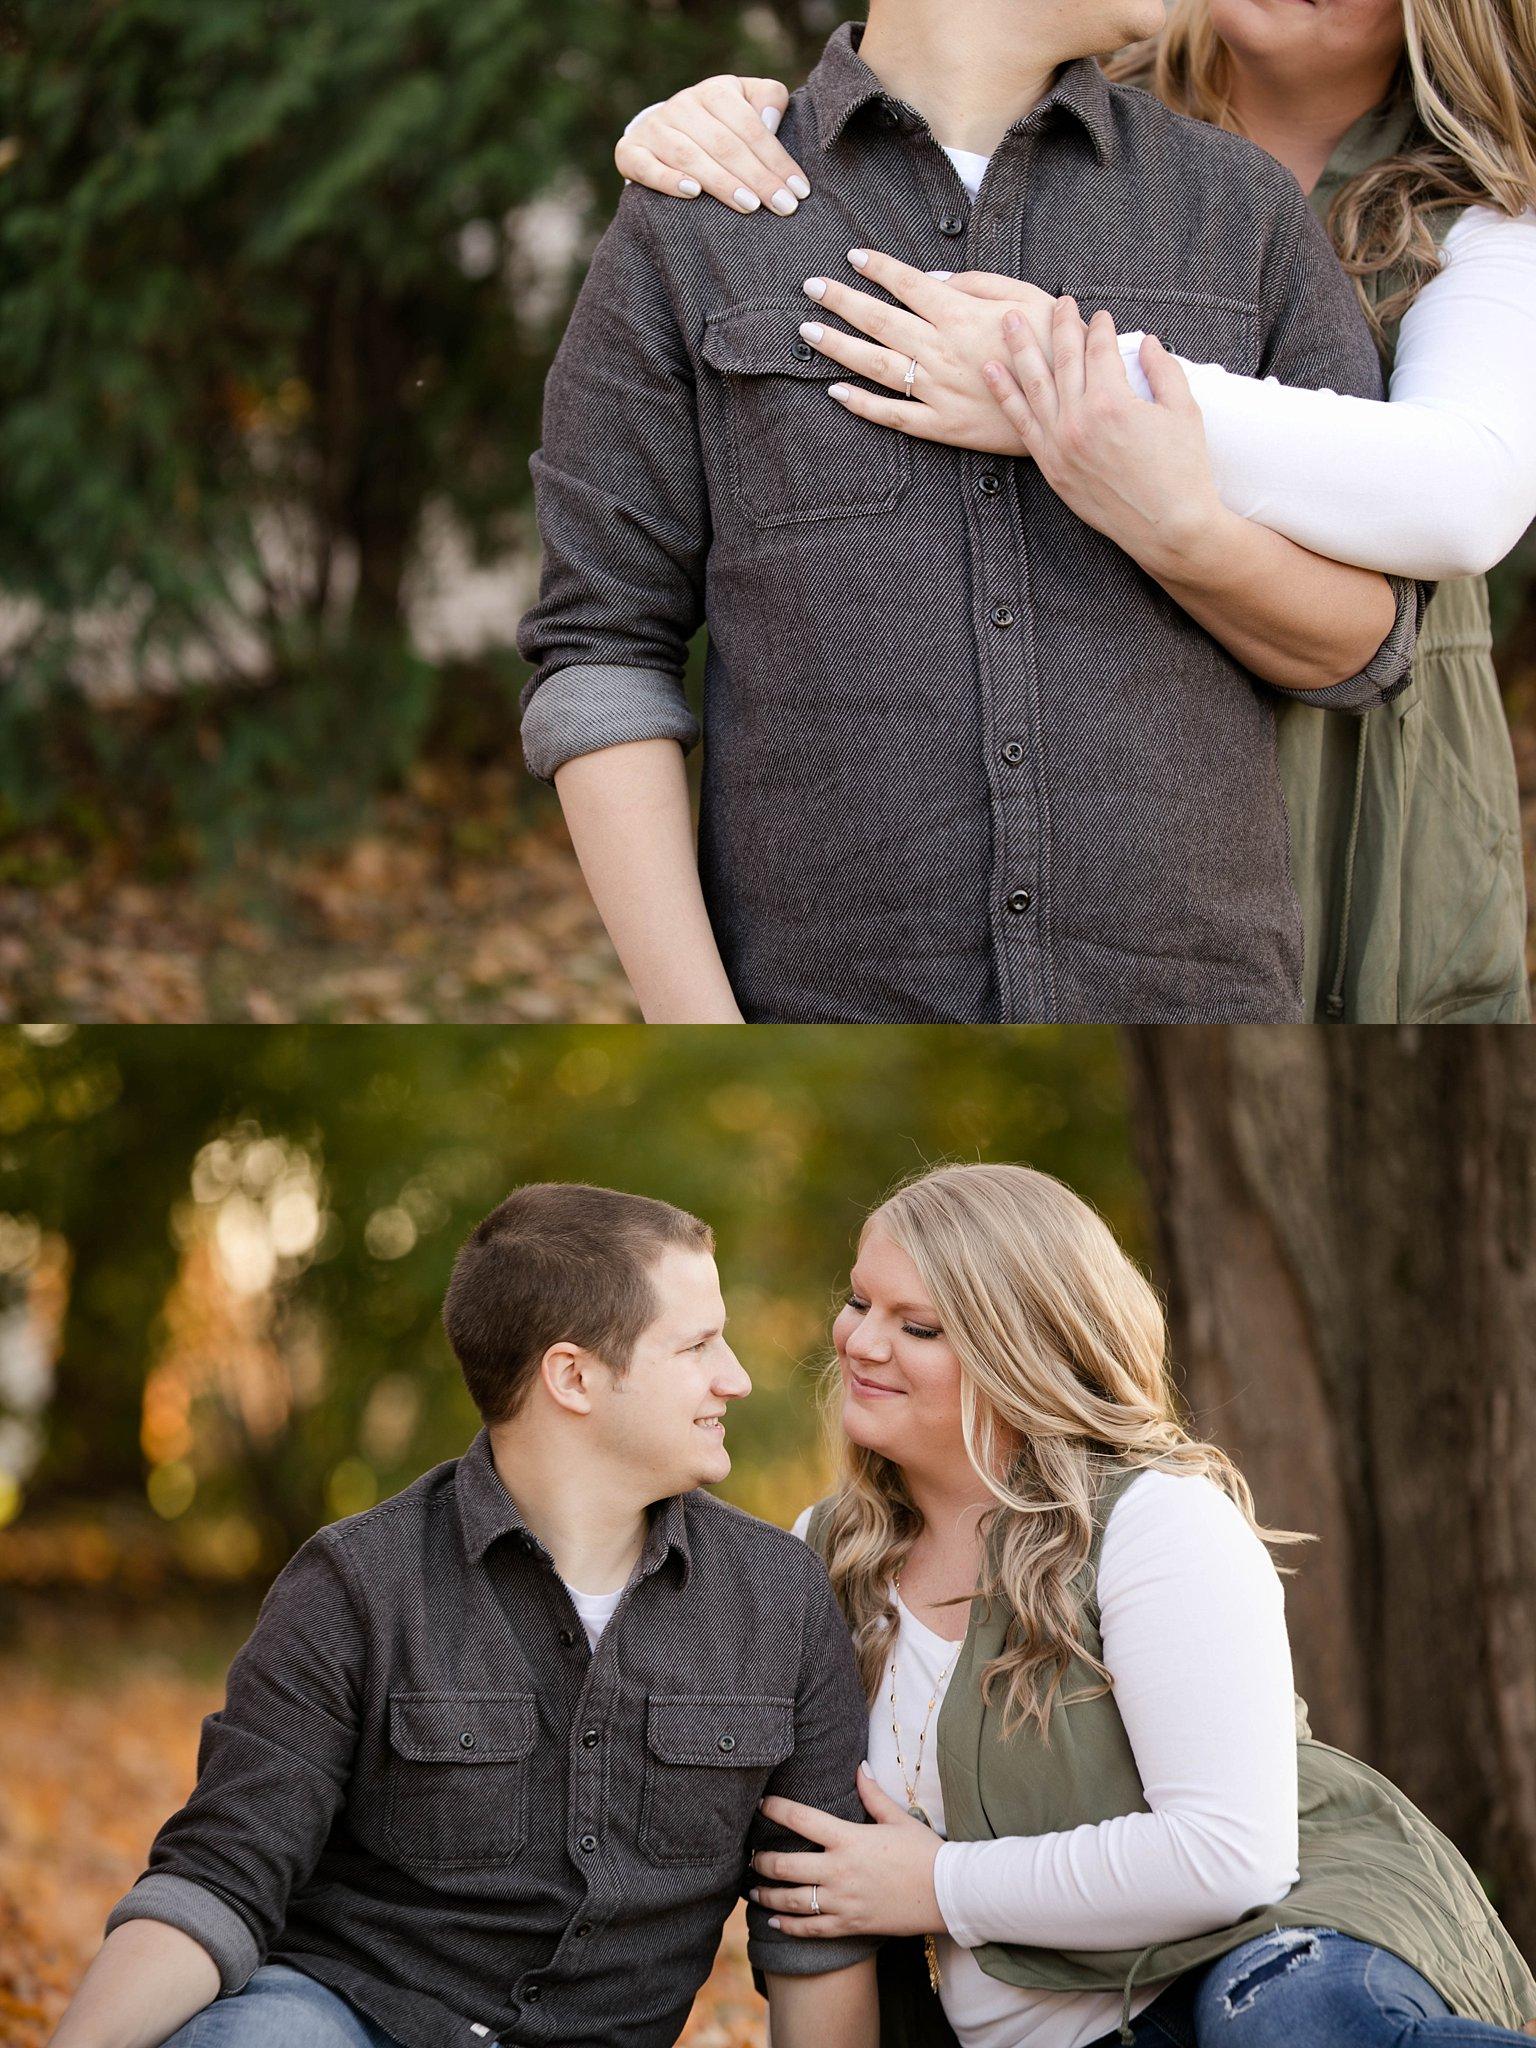 5Alice Hq Photography | Jordain + Kody | Southern MN Engagement.jpg